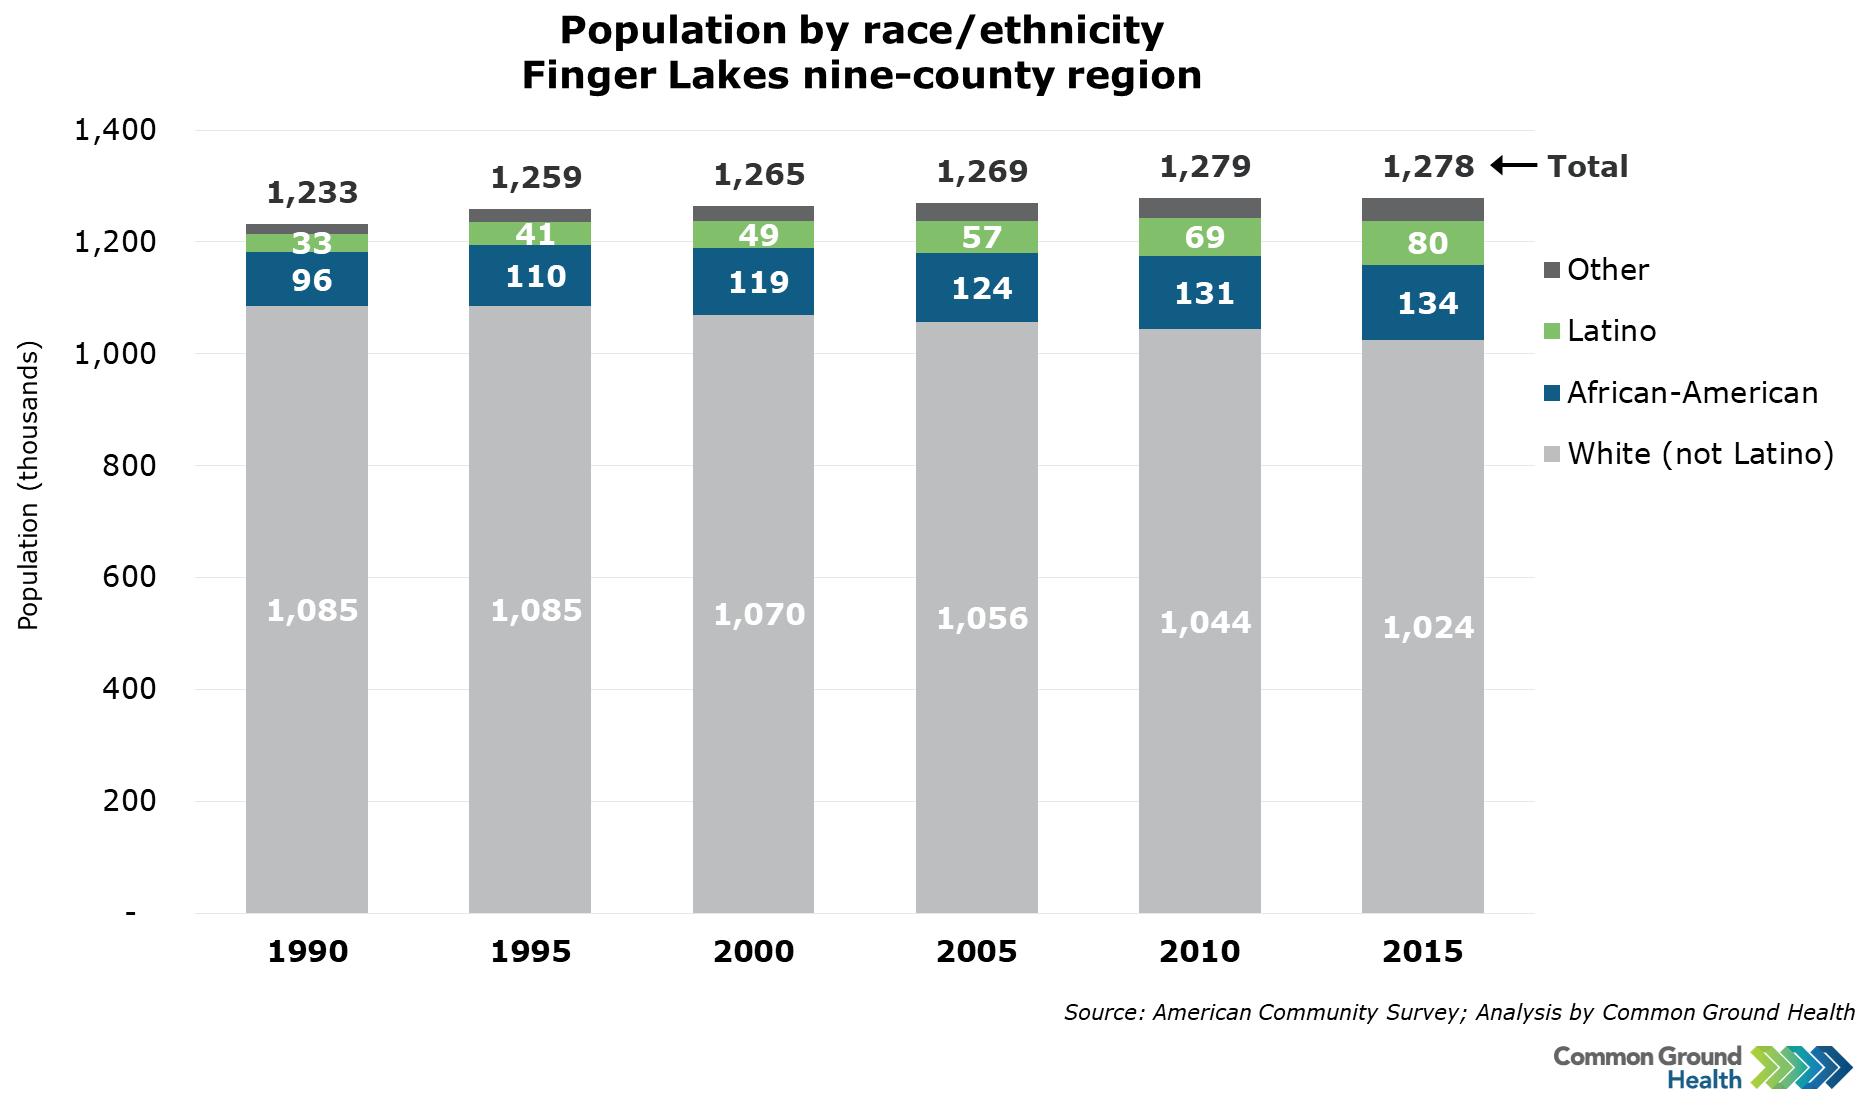 Population by Race/Ethnicity